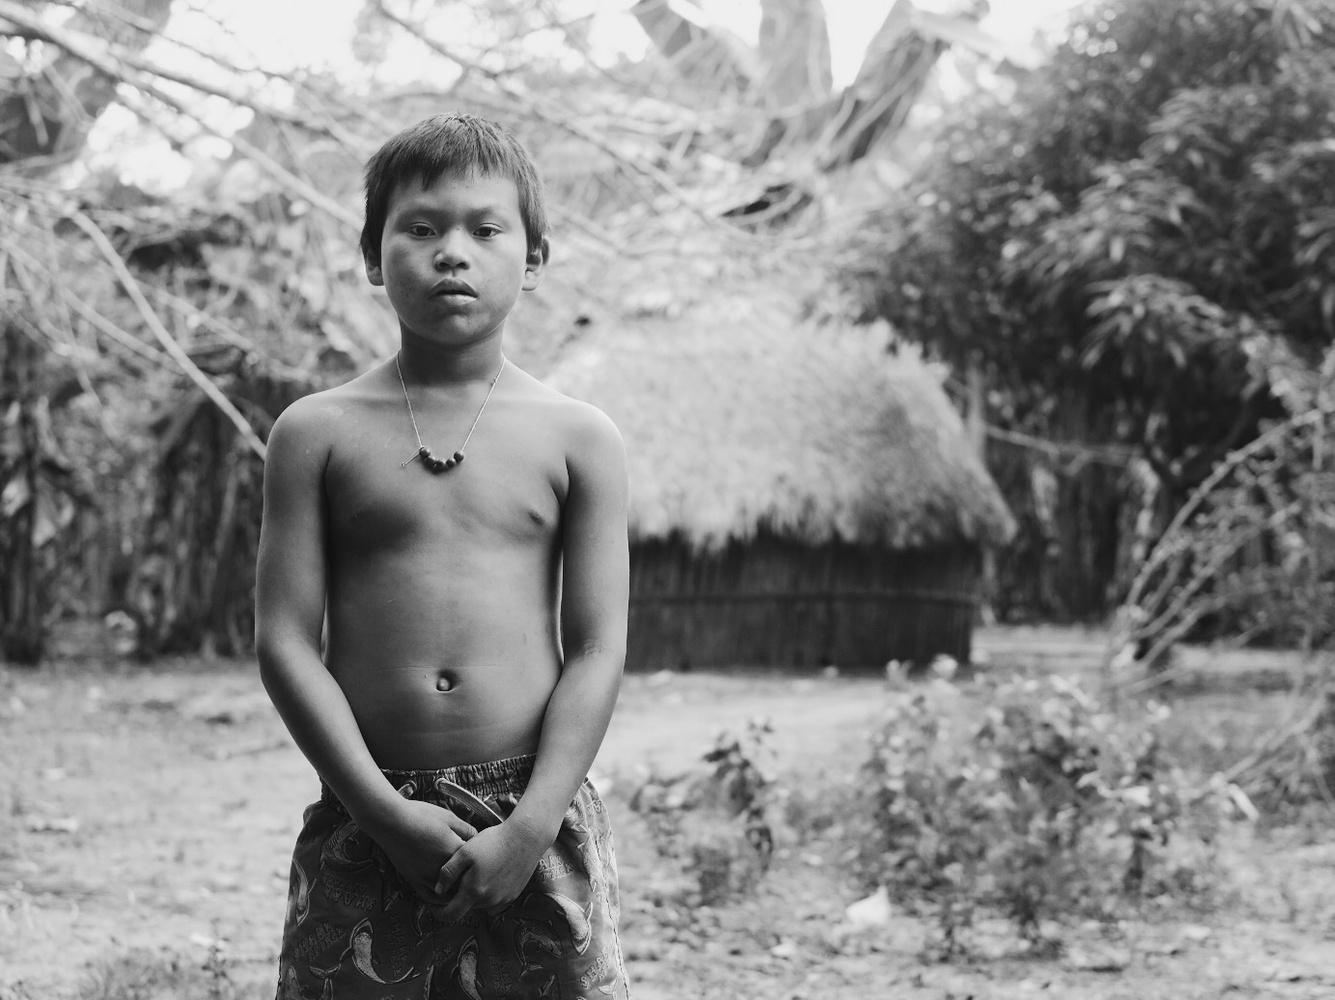 Callet in his Matsigenka village by Pedro Pulido